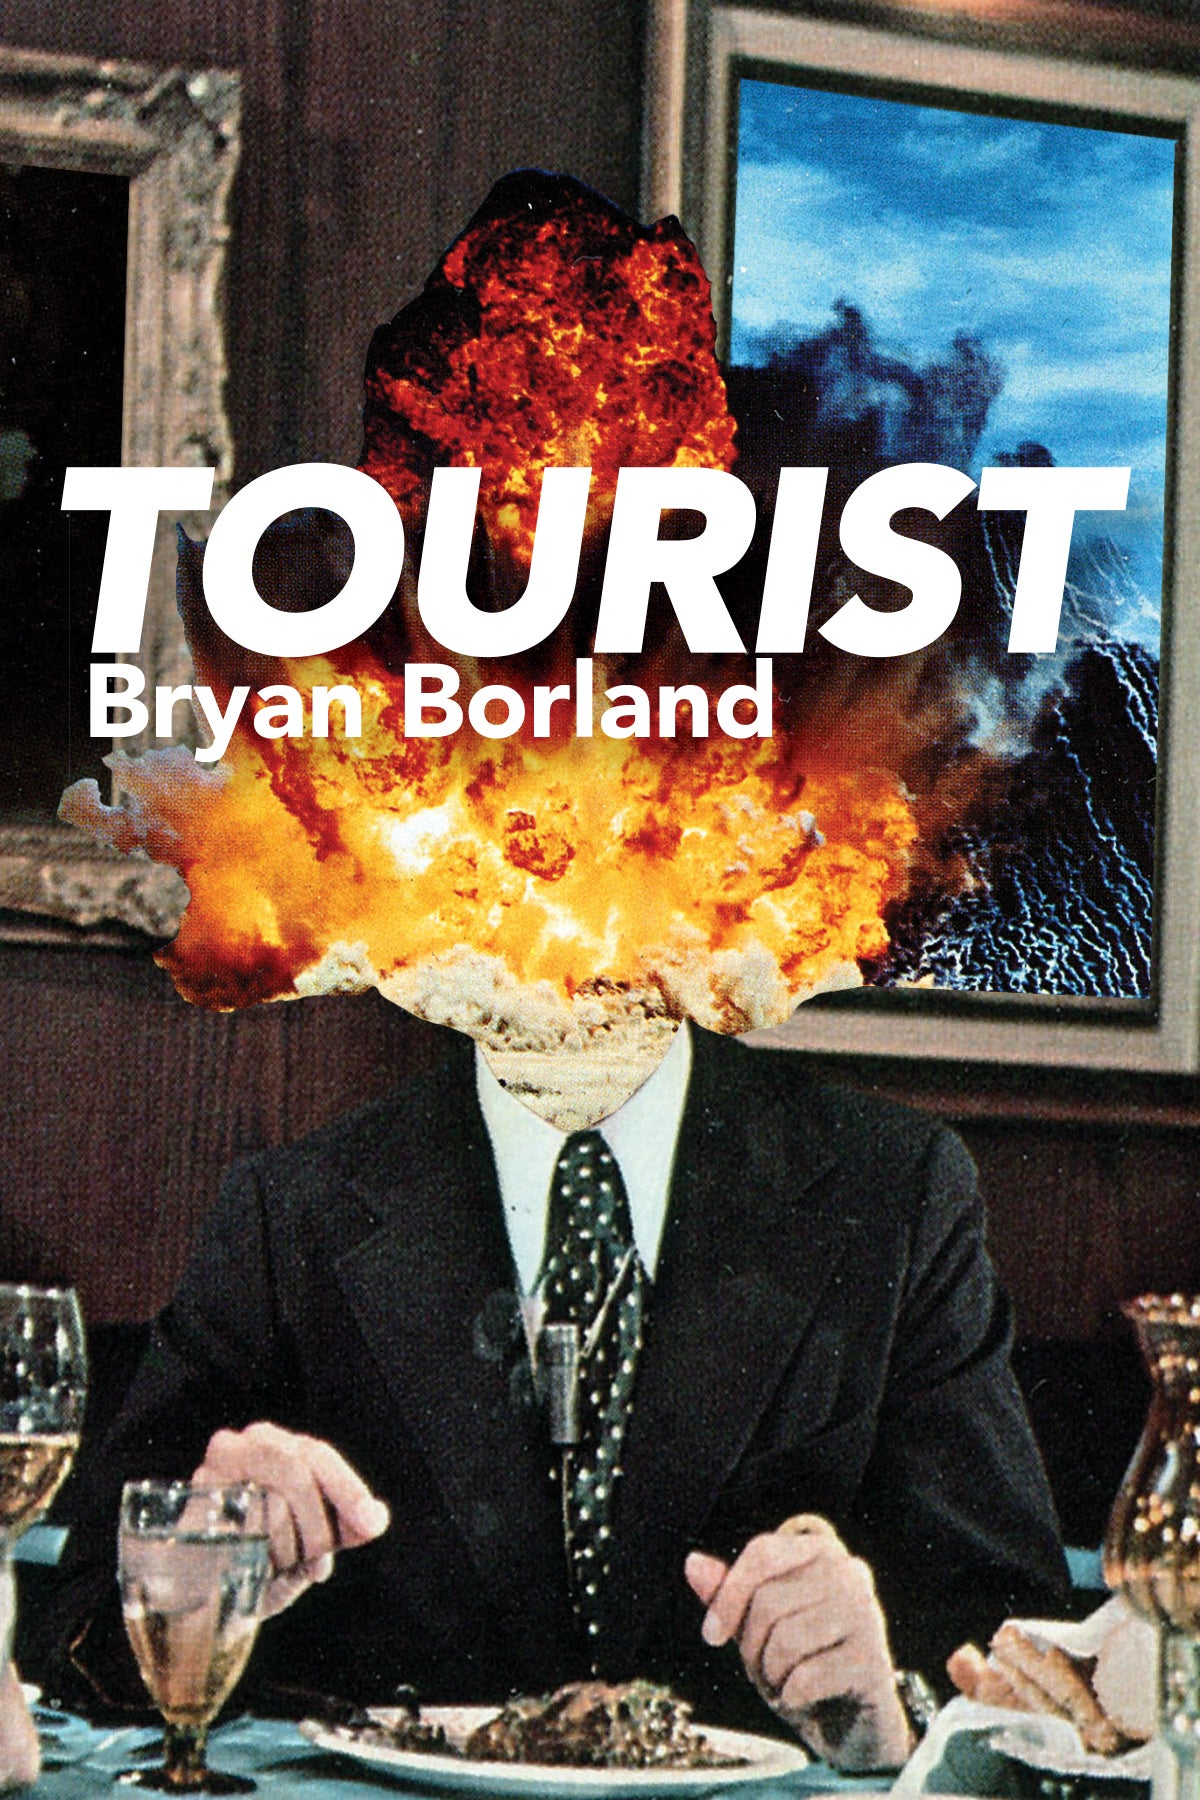 Image of Tourist by Bryan Borland